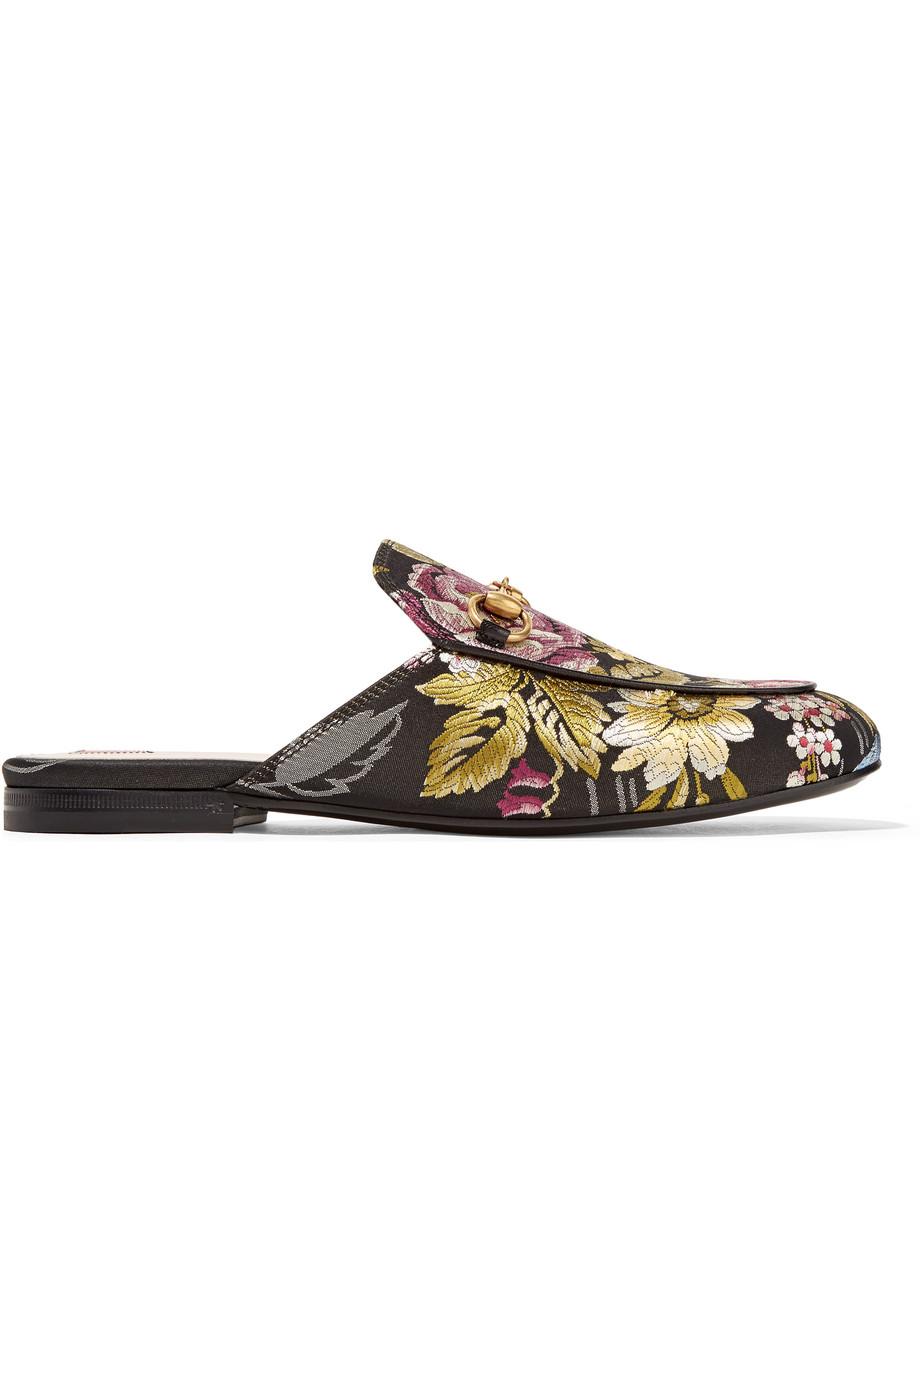 Gucci Princetown Horsebit-Detailed Jacquard Slippers, Black, Women's US Size: 10.5, Size: 41